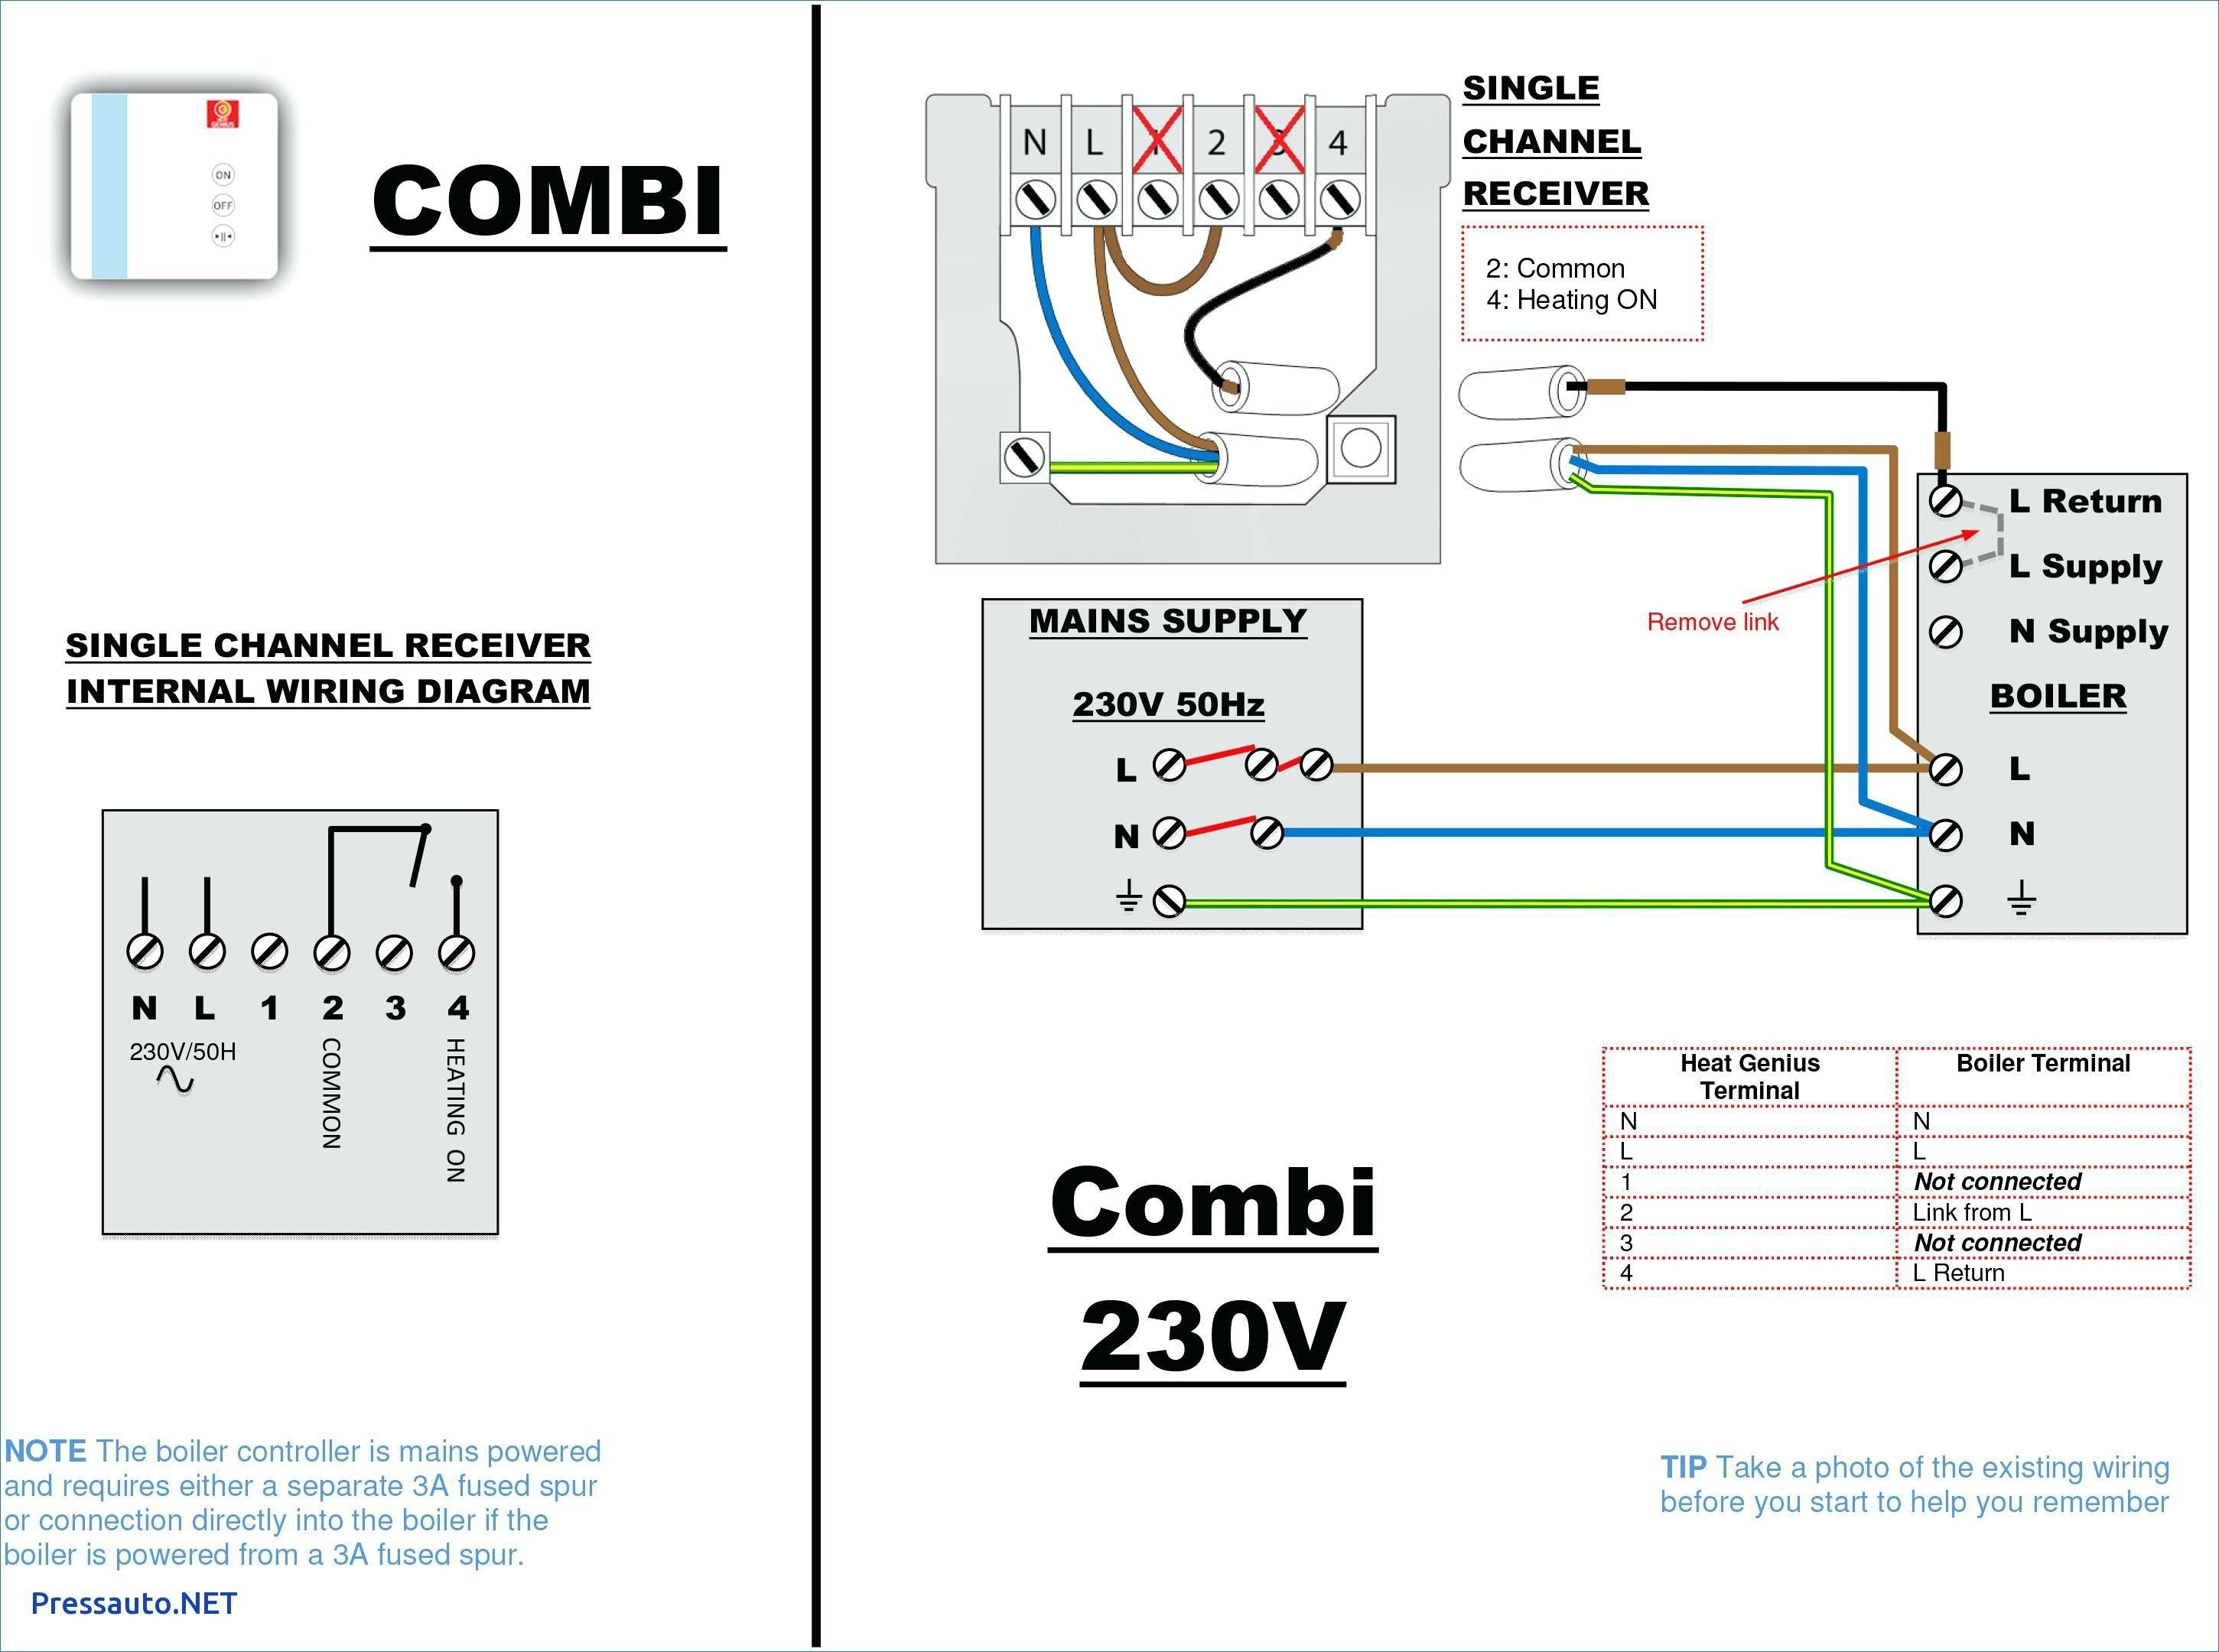 medium resolution of wiring diagram for fahrenheat electric baseboard heater diagram diagramtemplate diagramsample